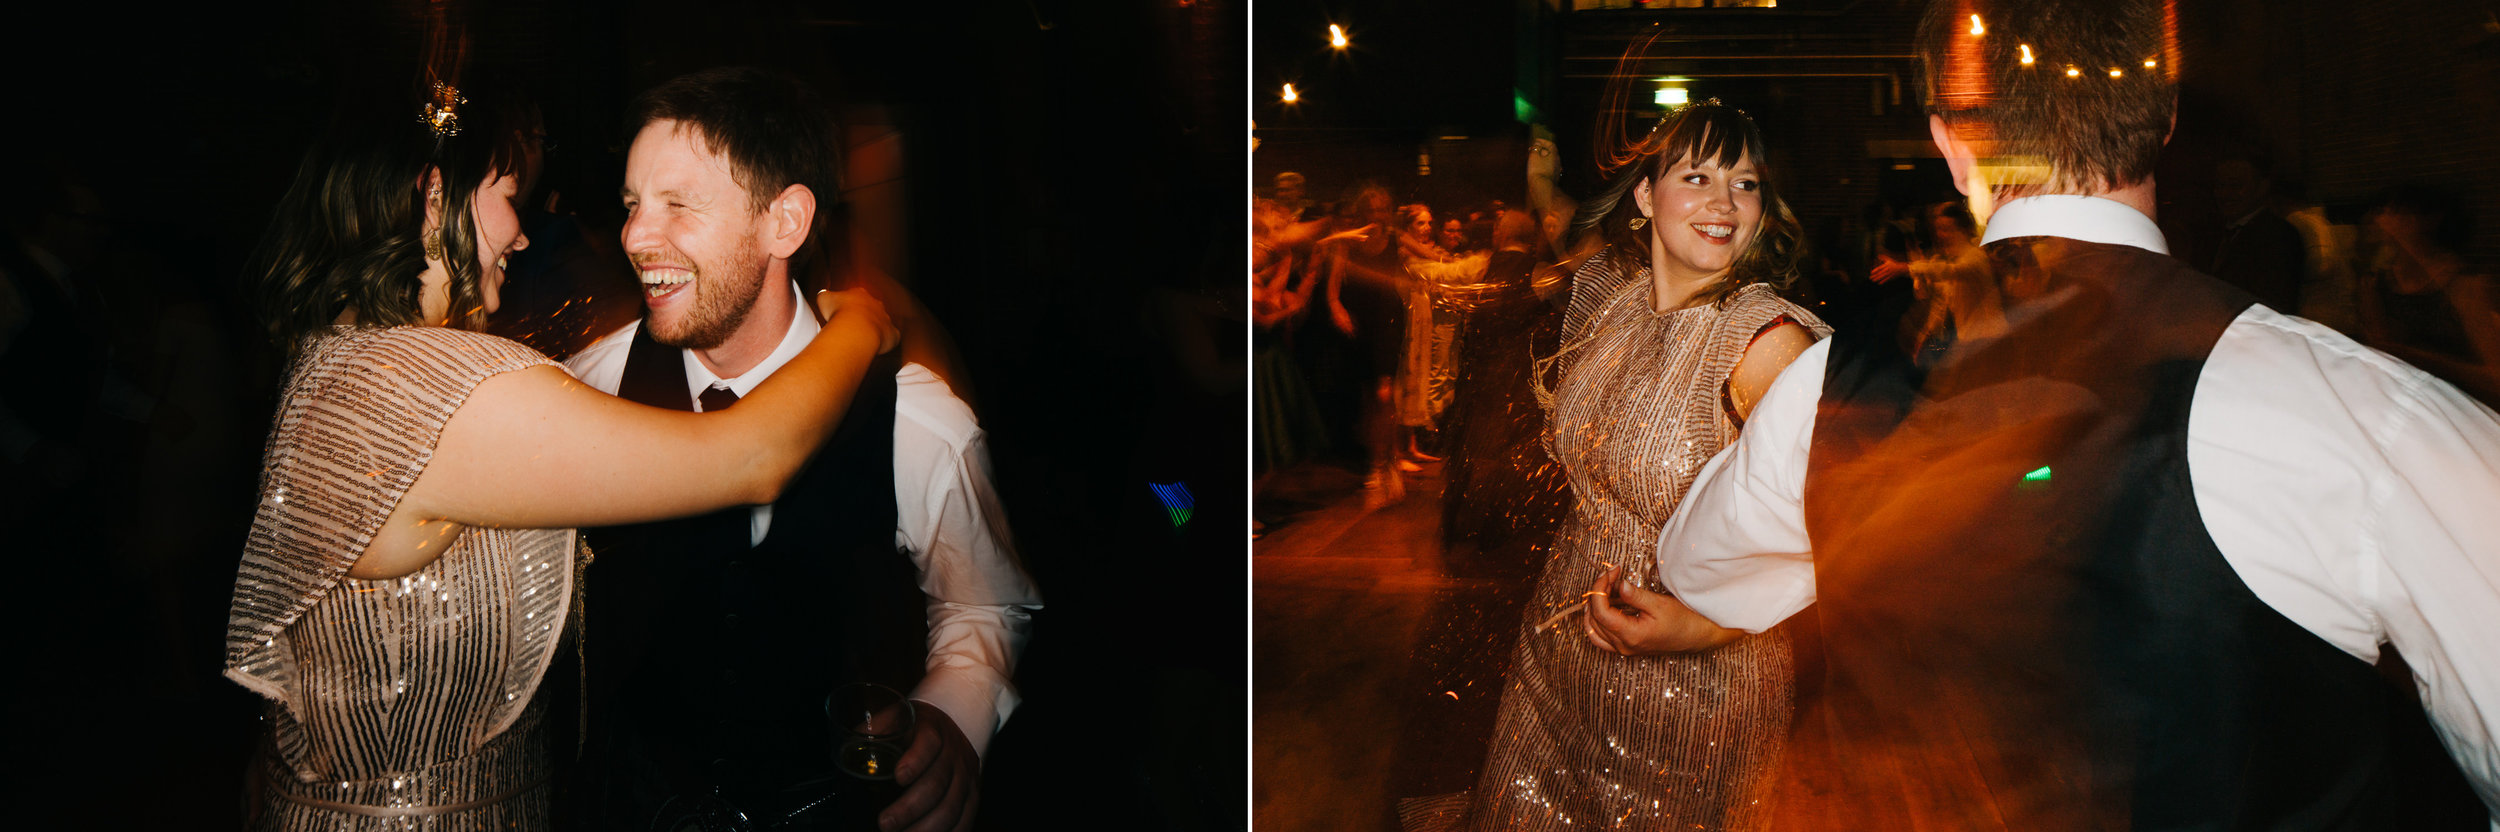 amsterdam-wedding-photographer-trouwfotograaf-bruidsfotograaf-mark-hadden-bruidsfotografie-David & Ronald-419 copy.jpg